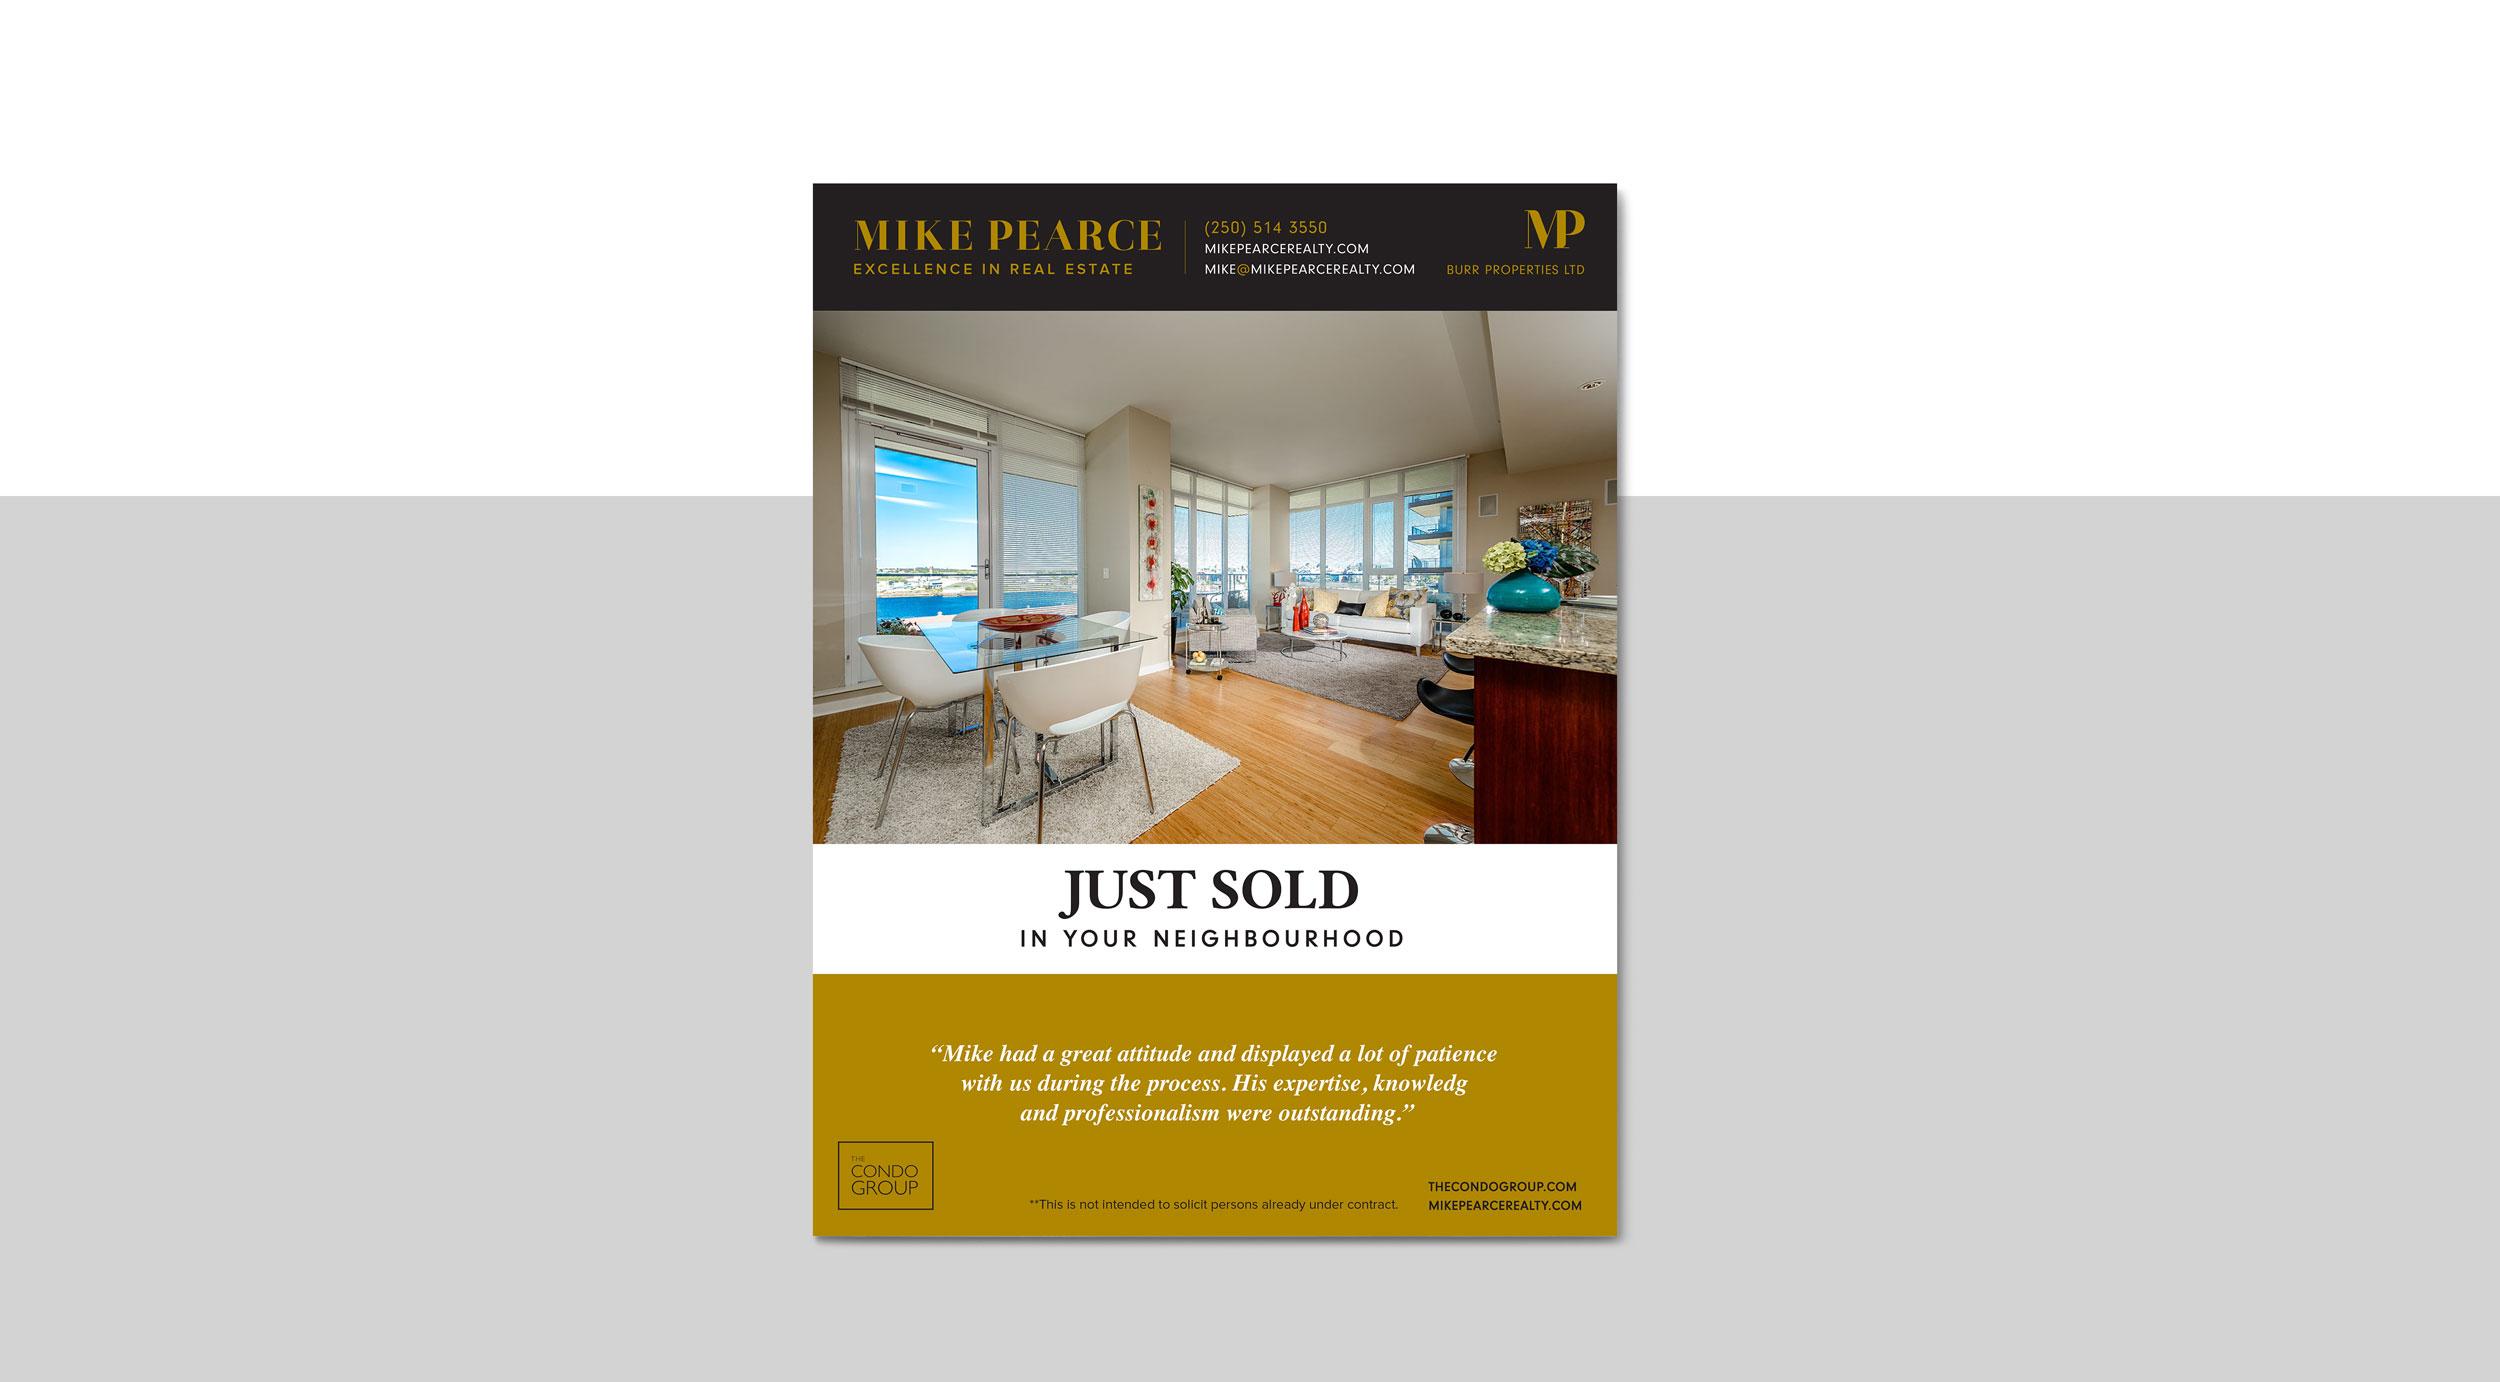 mp-sell-sheets-graphic-design-megan-munro.jpg